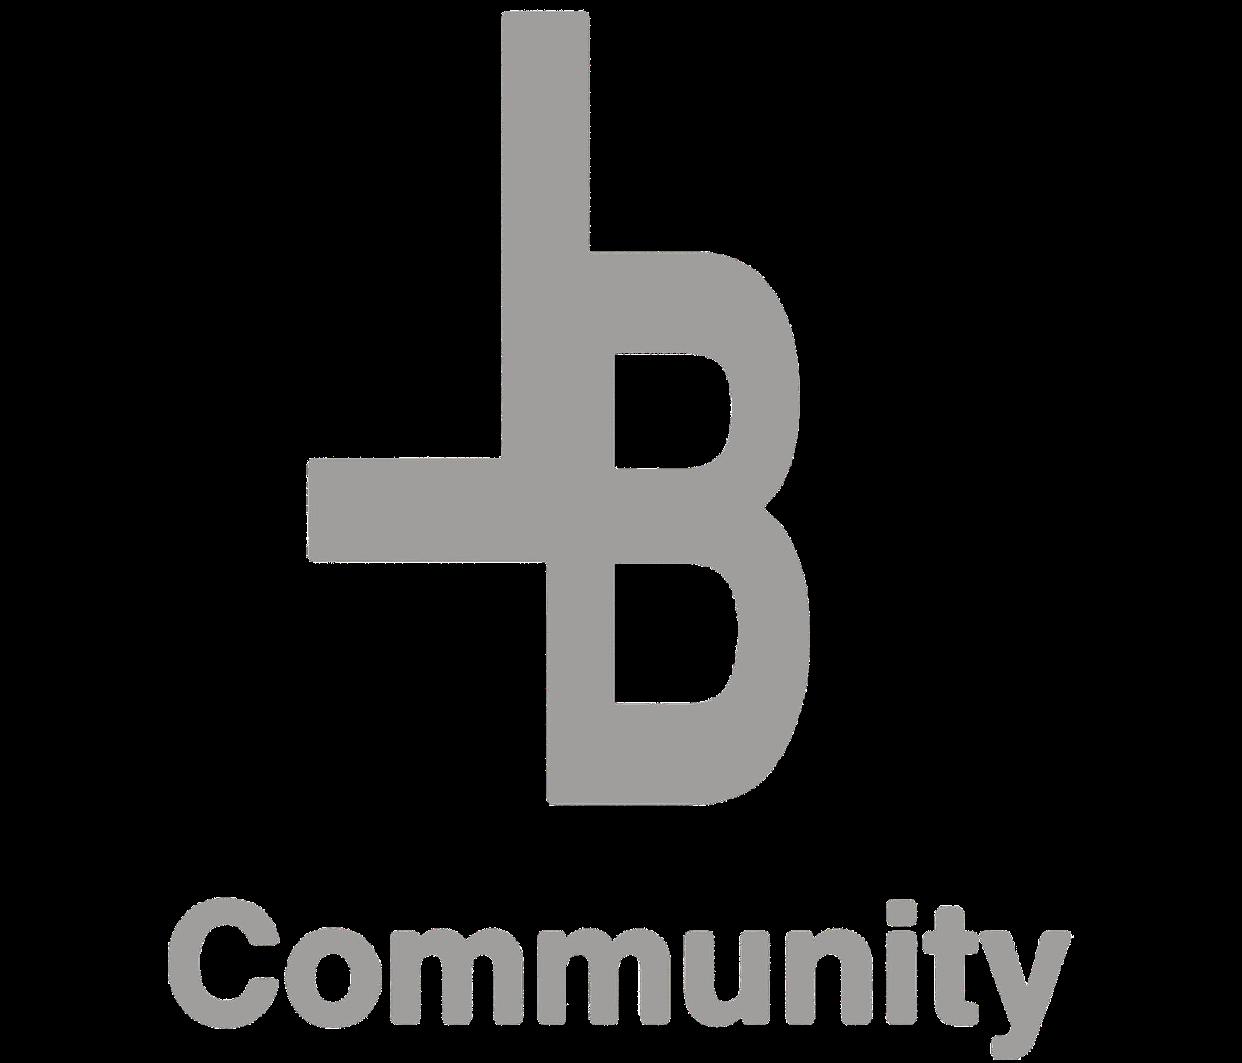 BLCommunity-Logo.png